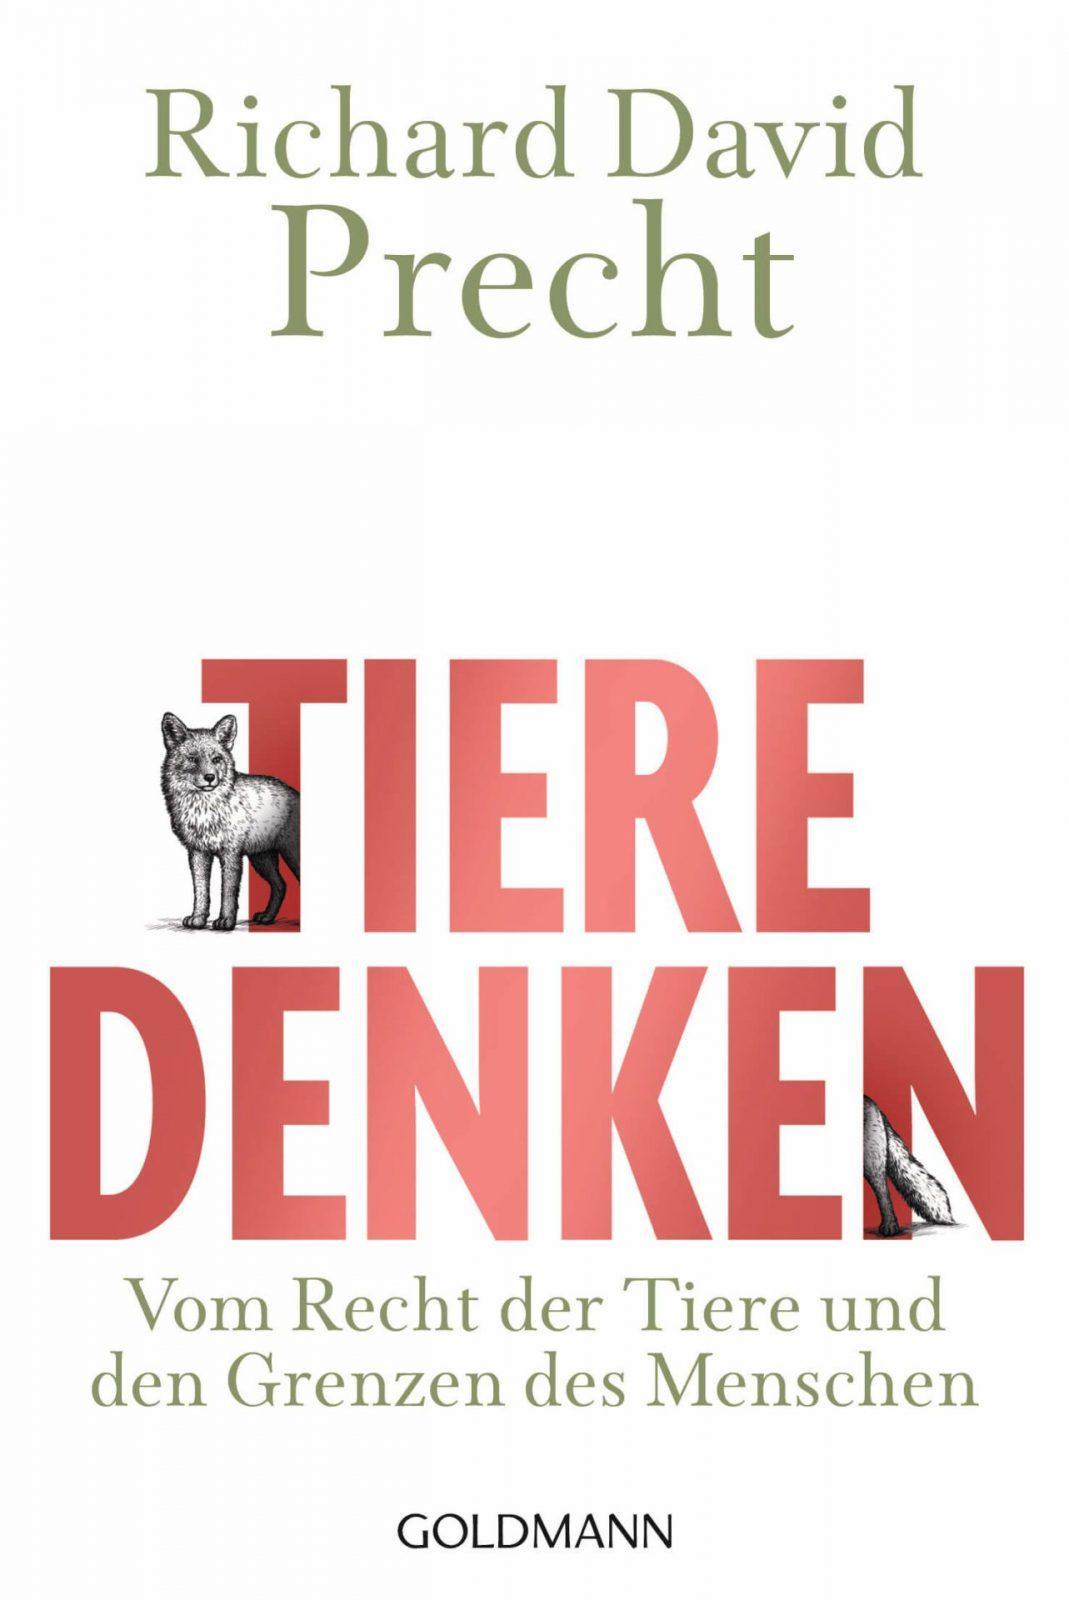 Richard David Precht, Philosoph, Autor, Tiere denken, Madamewien.at